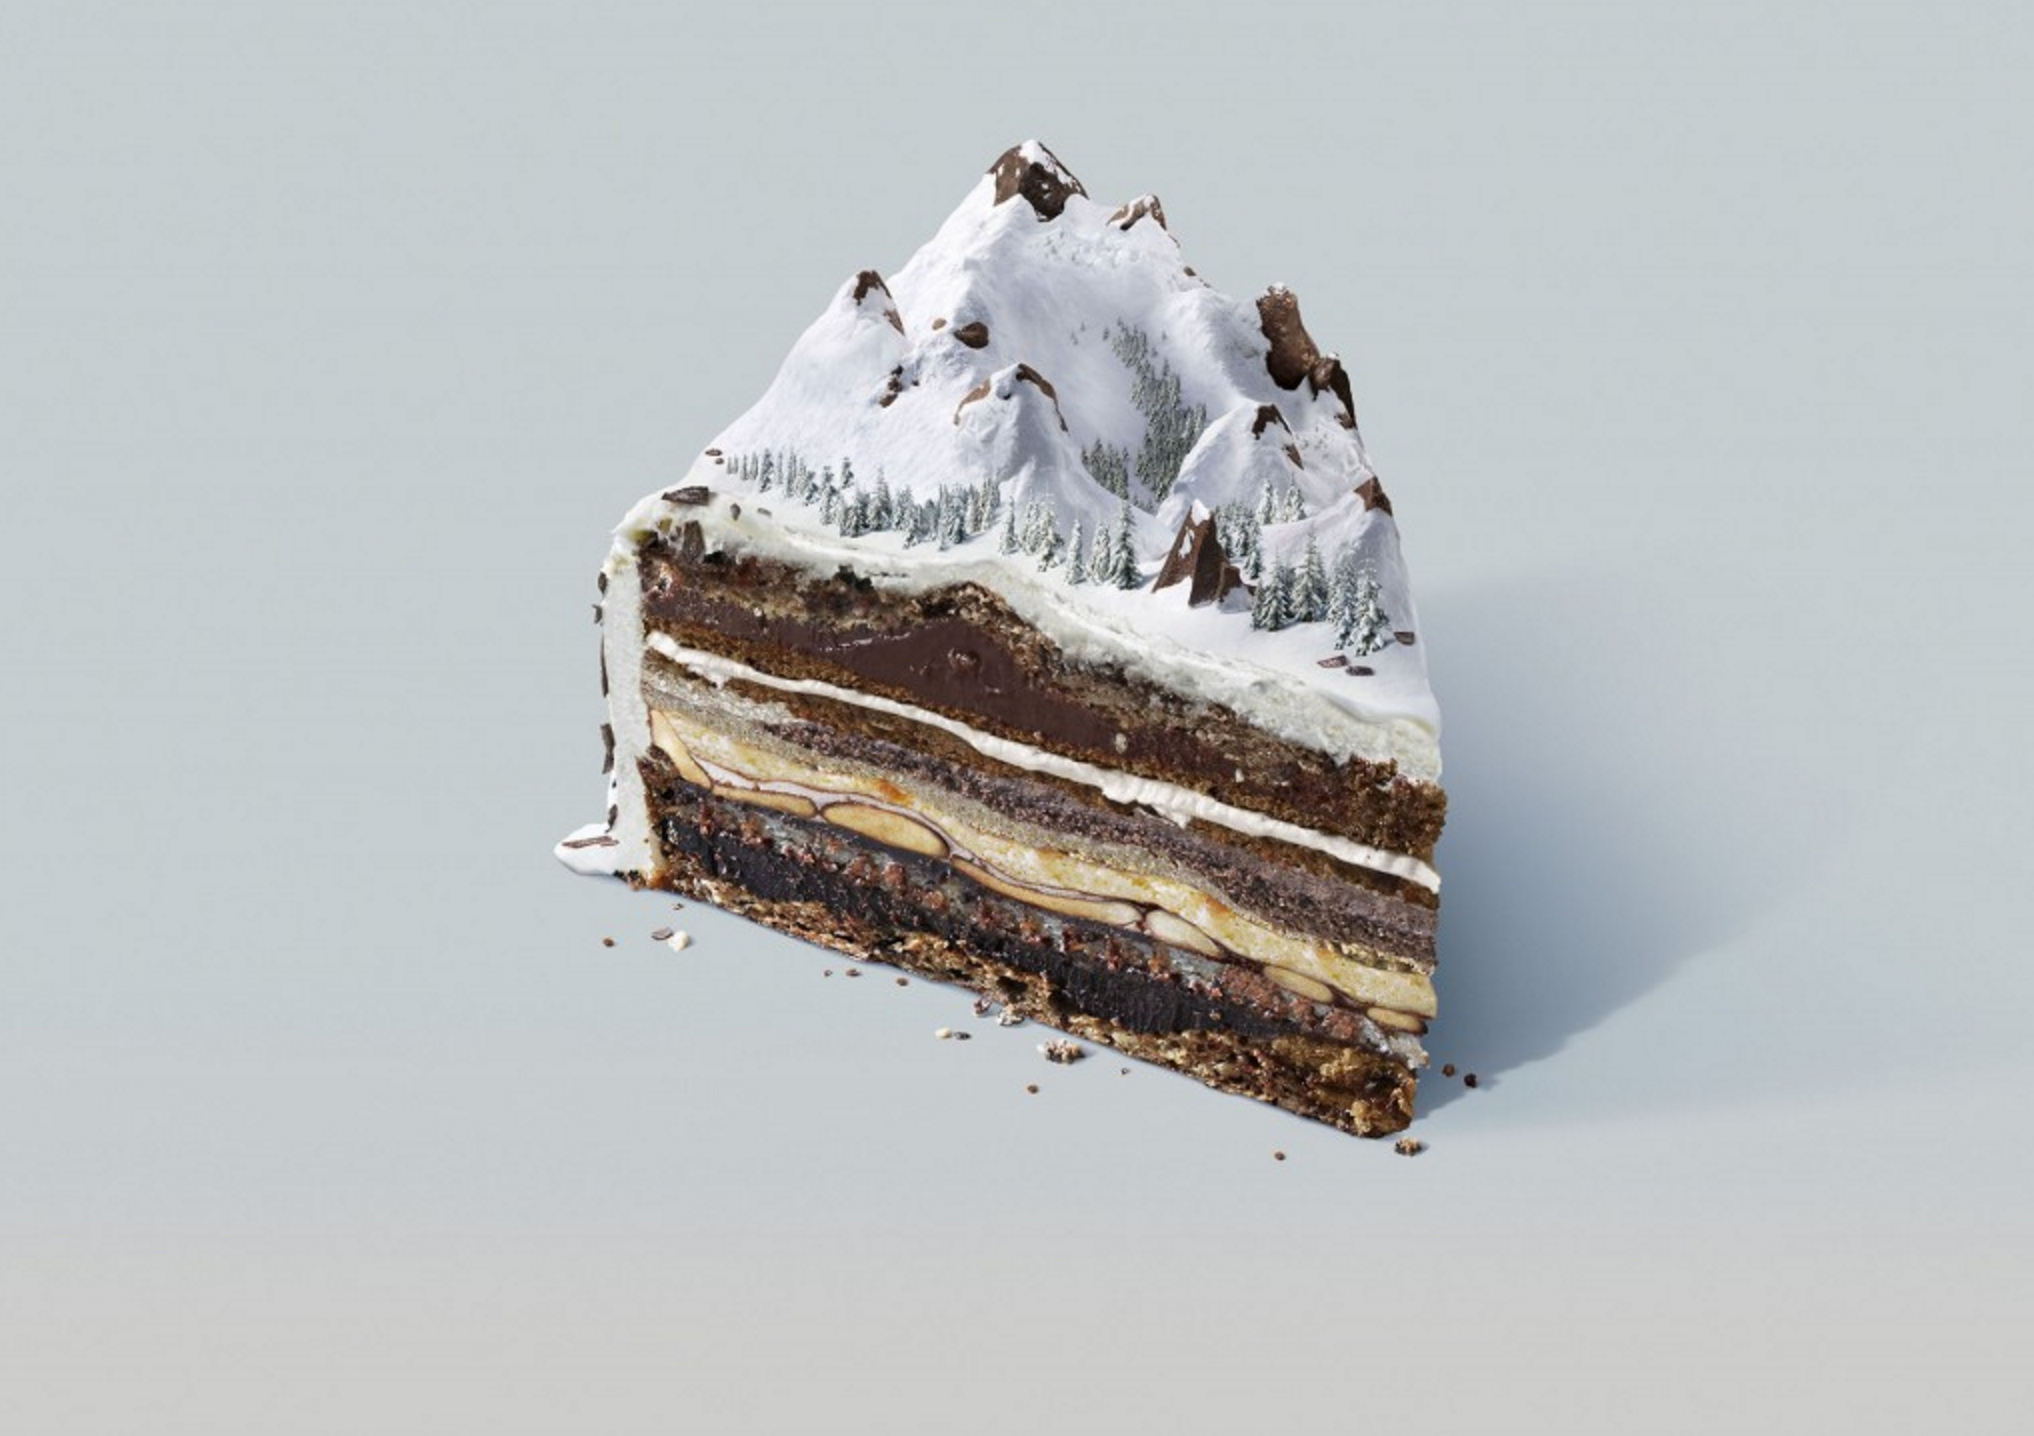 Nissan Xterra SUV – Snow Cake